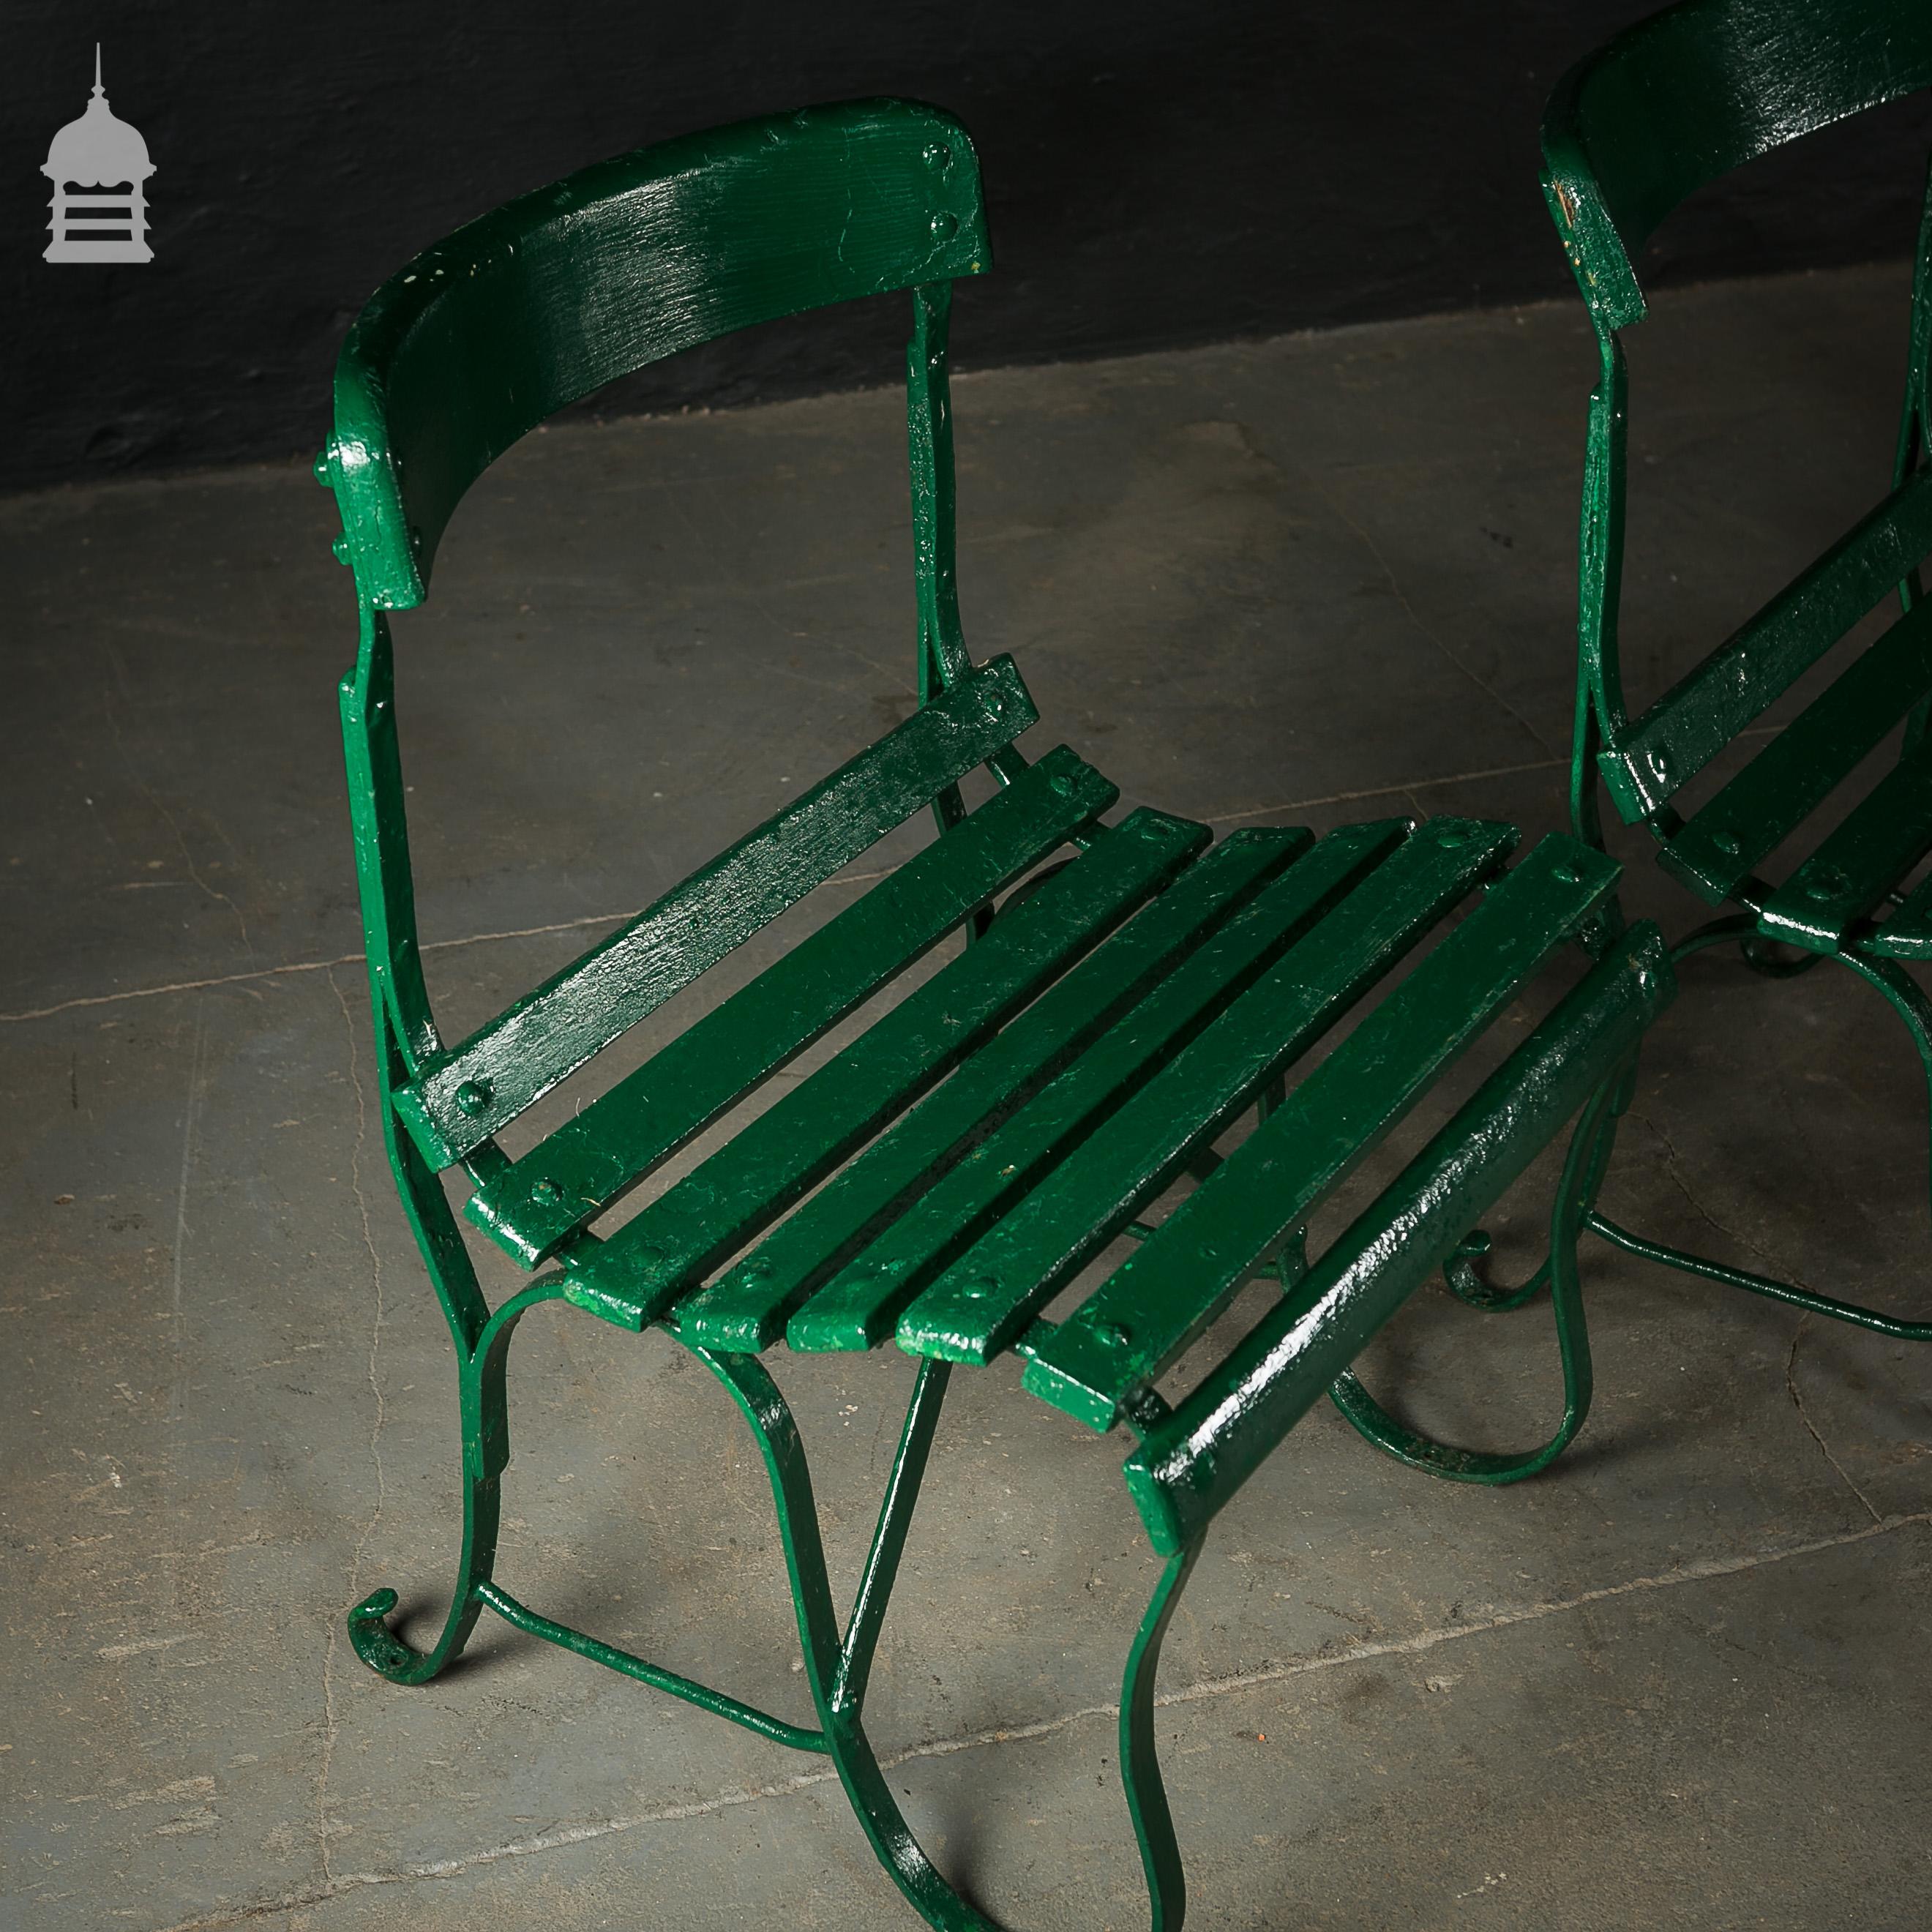 4 Wrought Iron Garden Chairs with Hardwood Slats 6